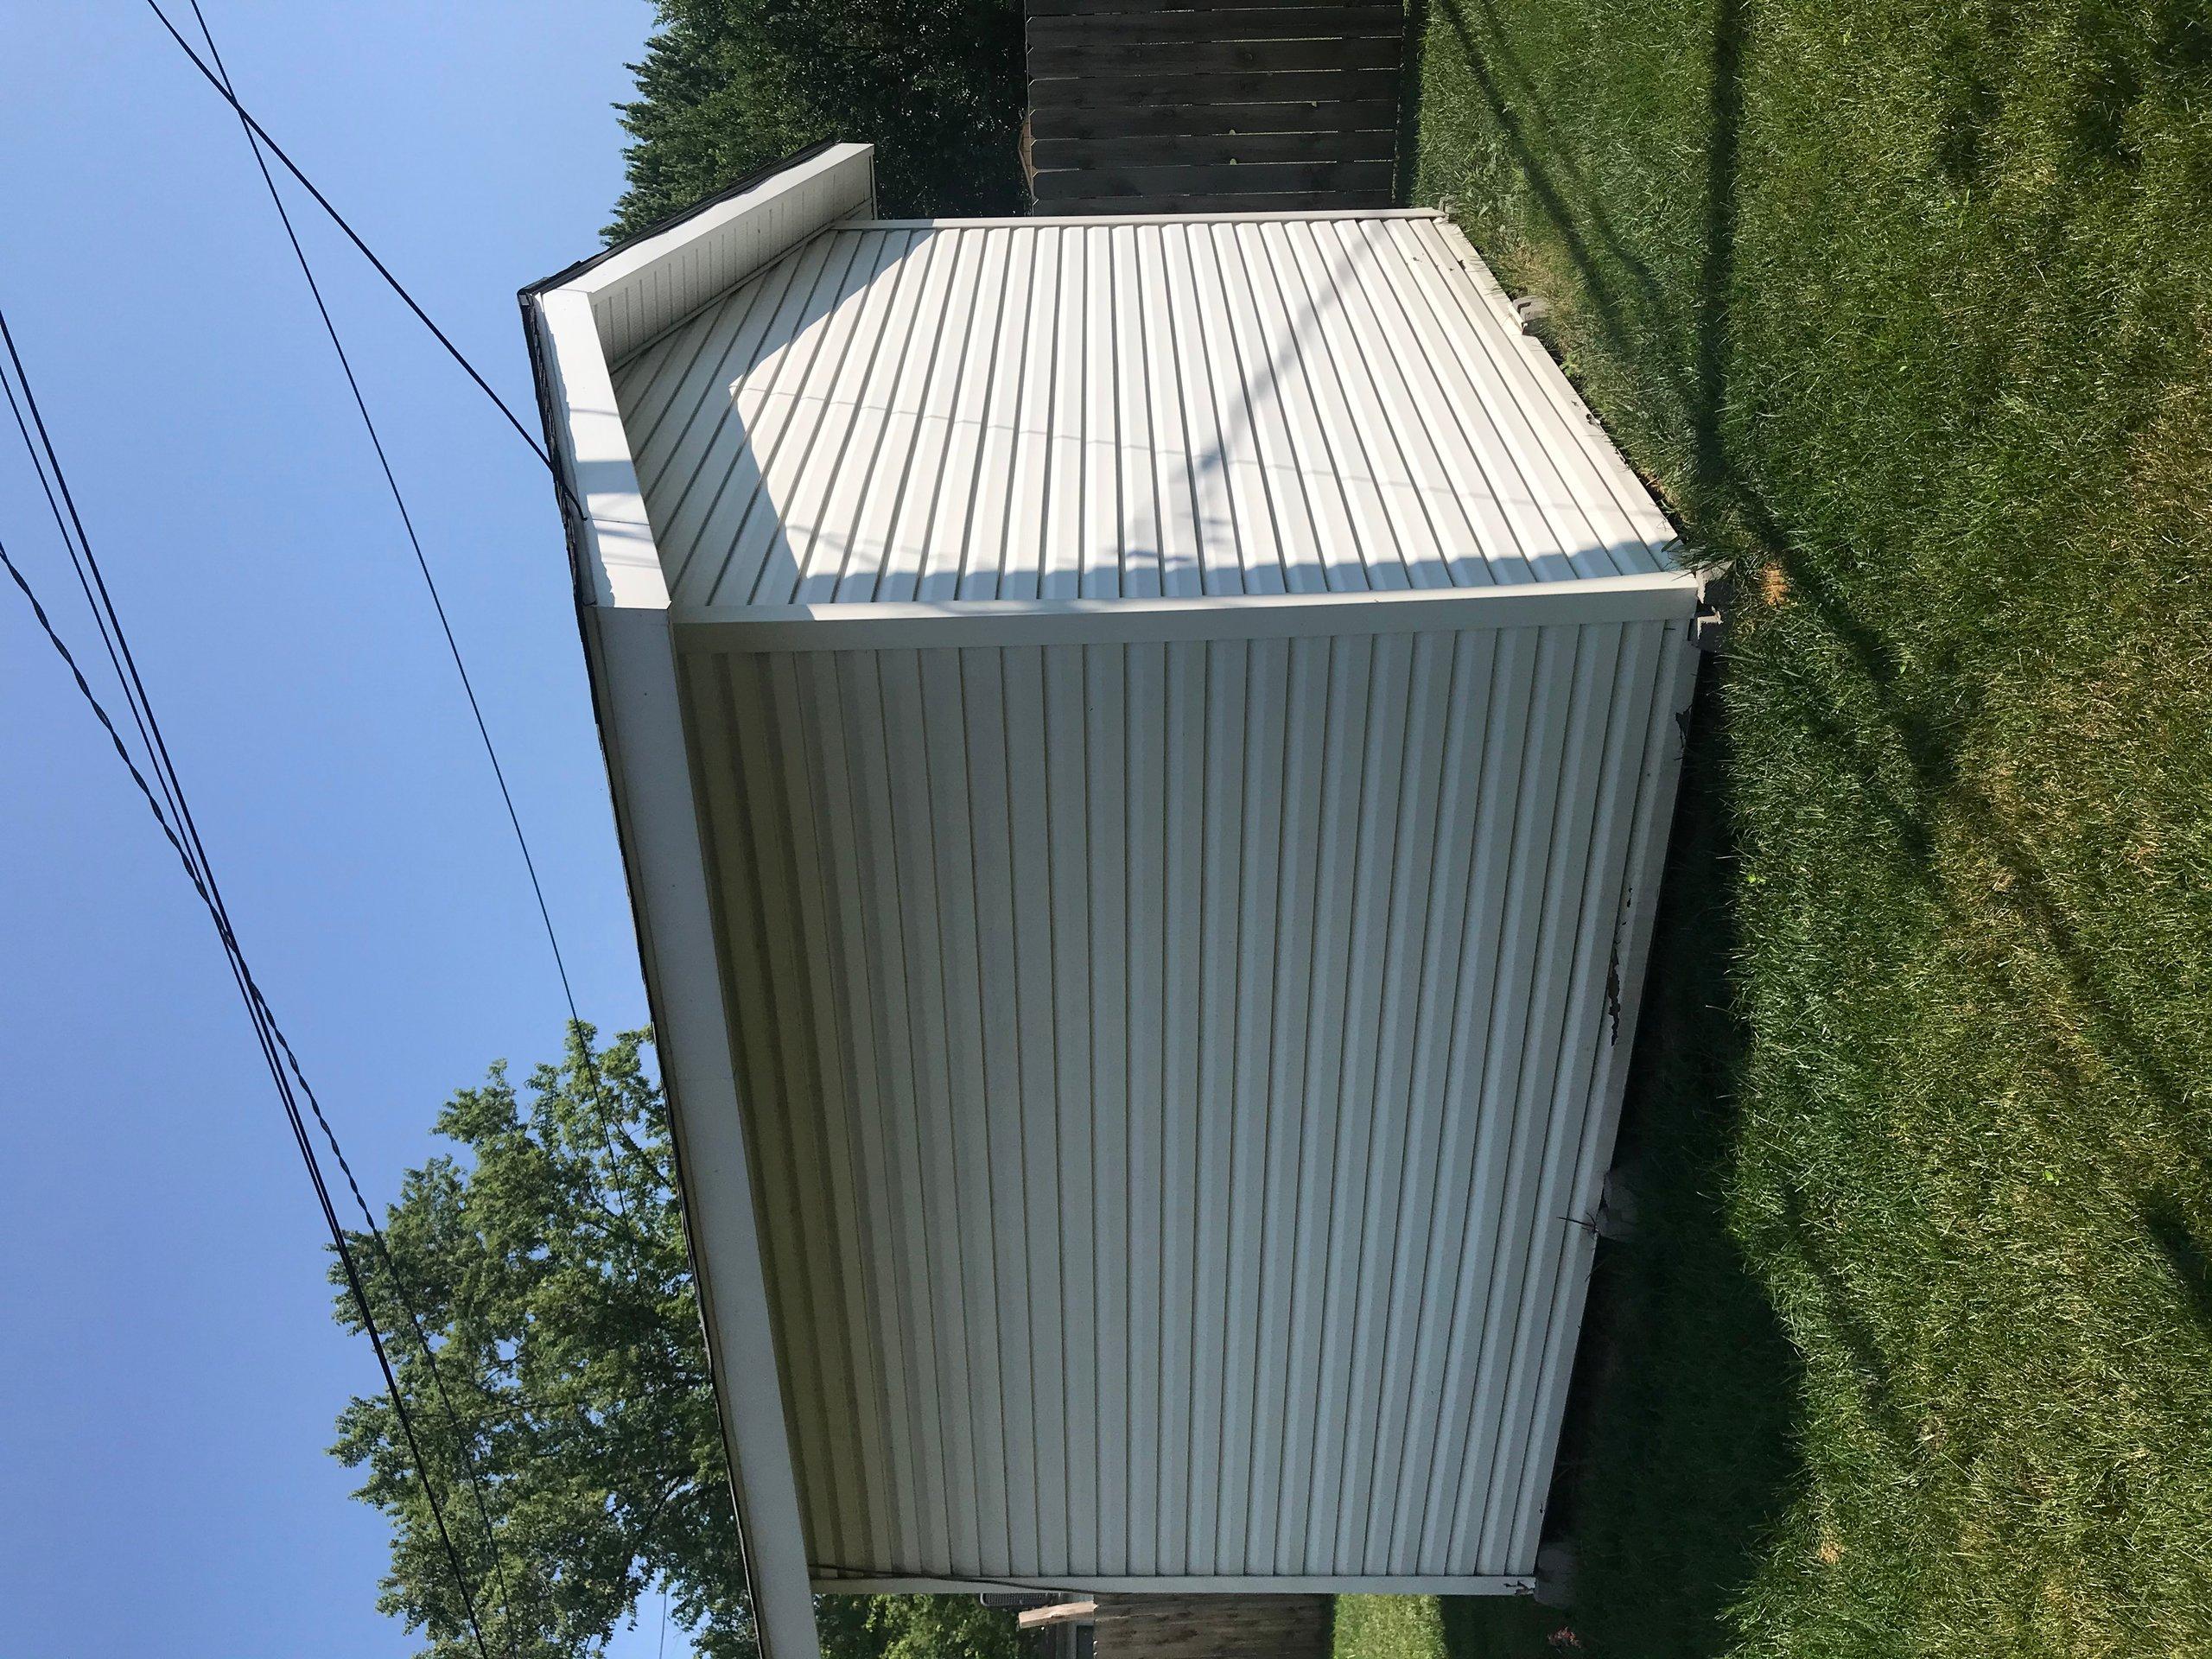 12x12 Shed self storage unit